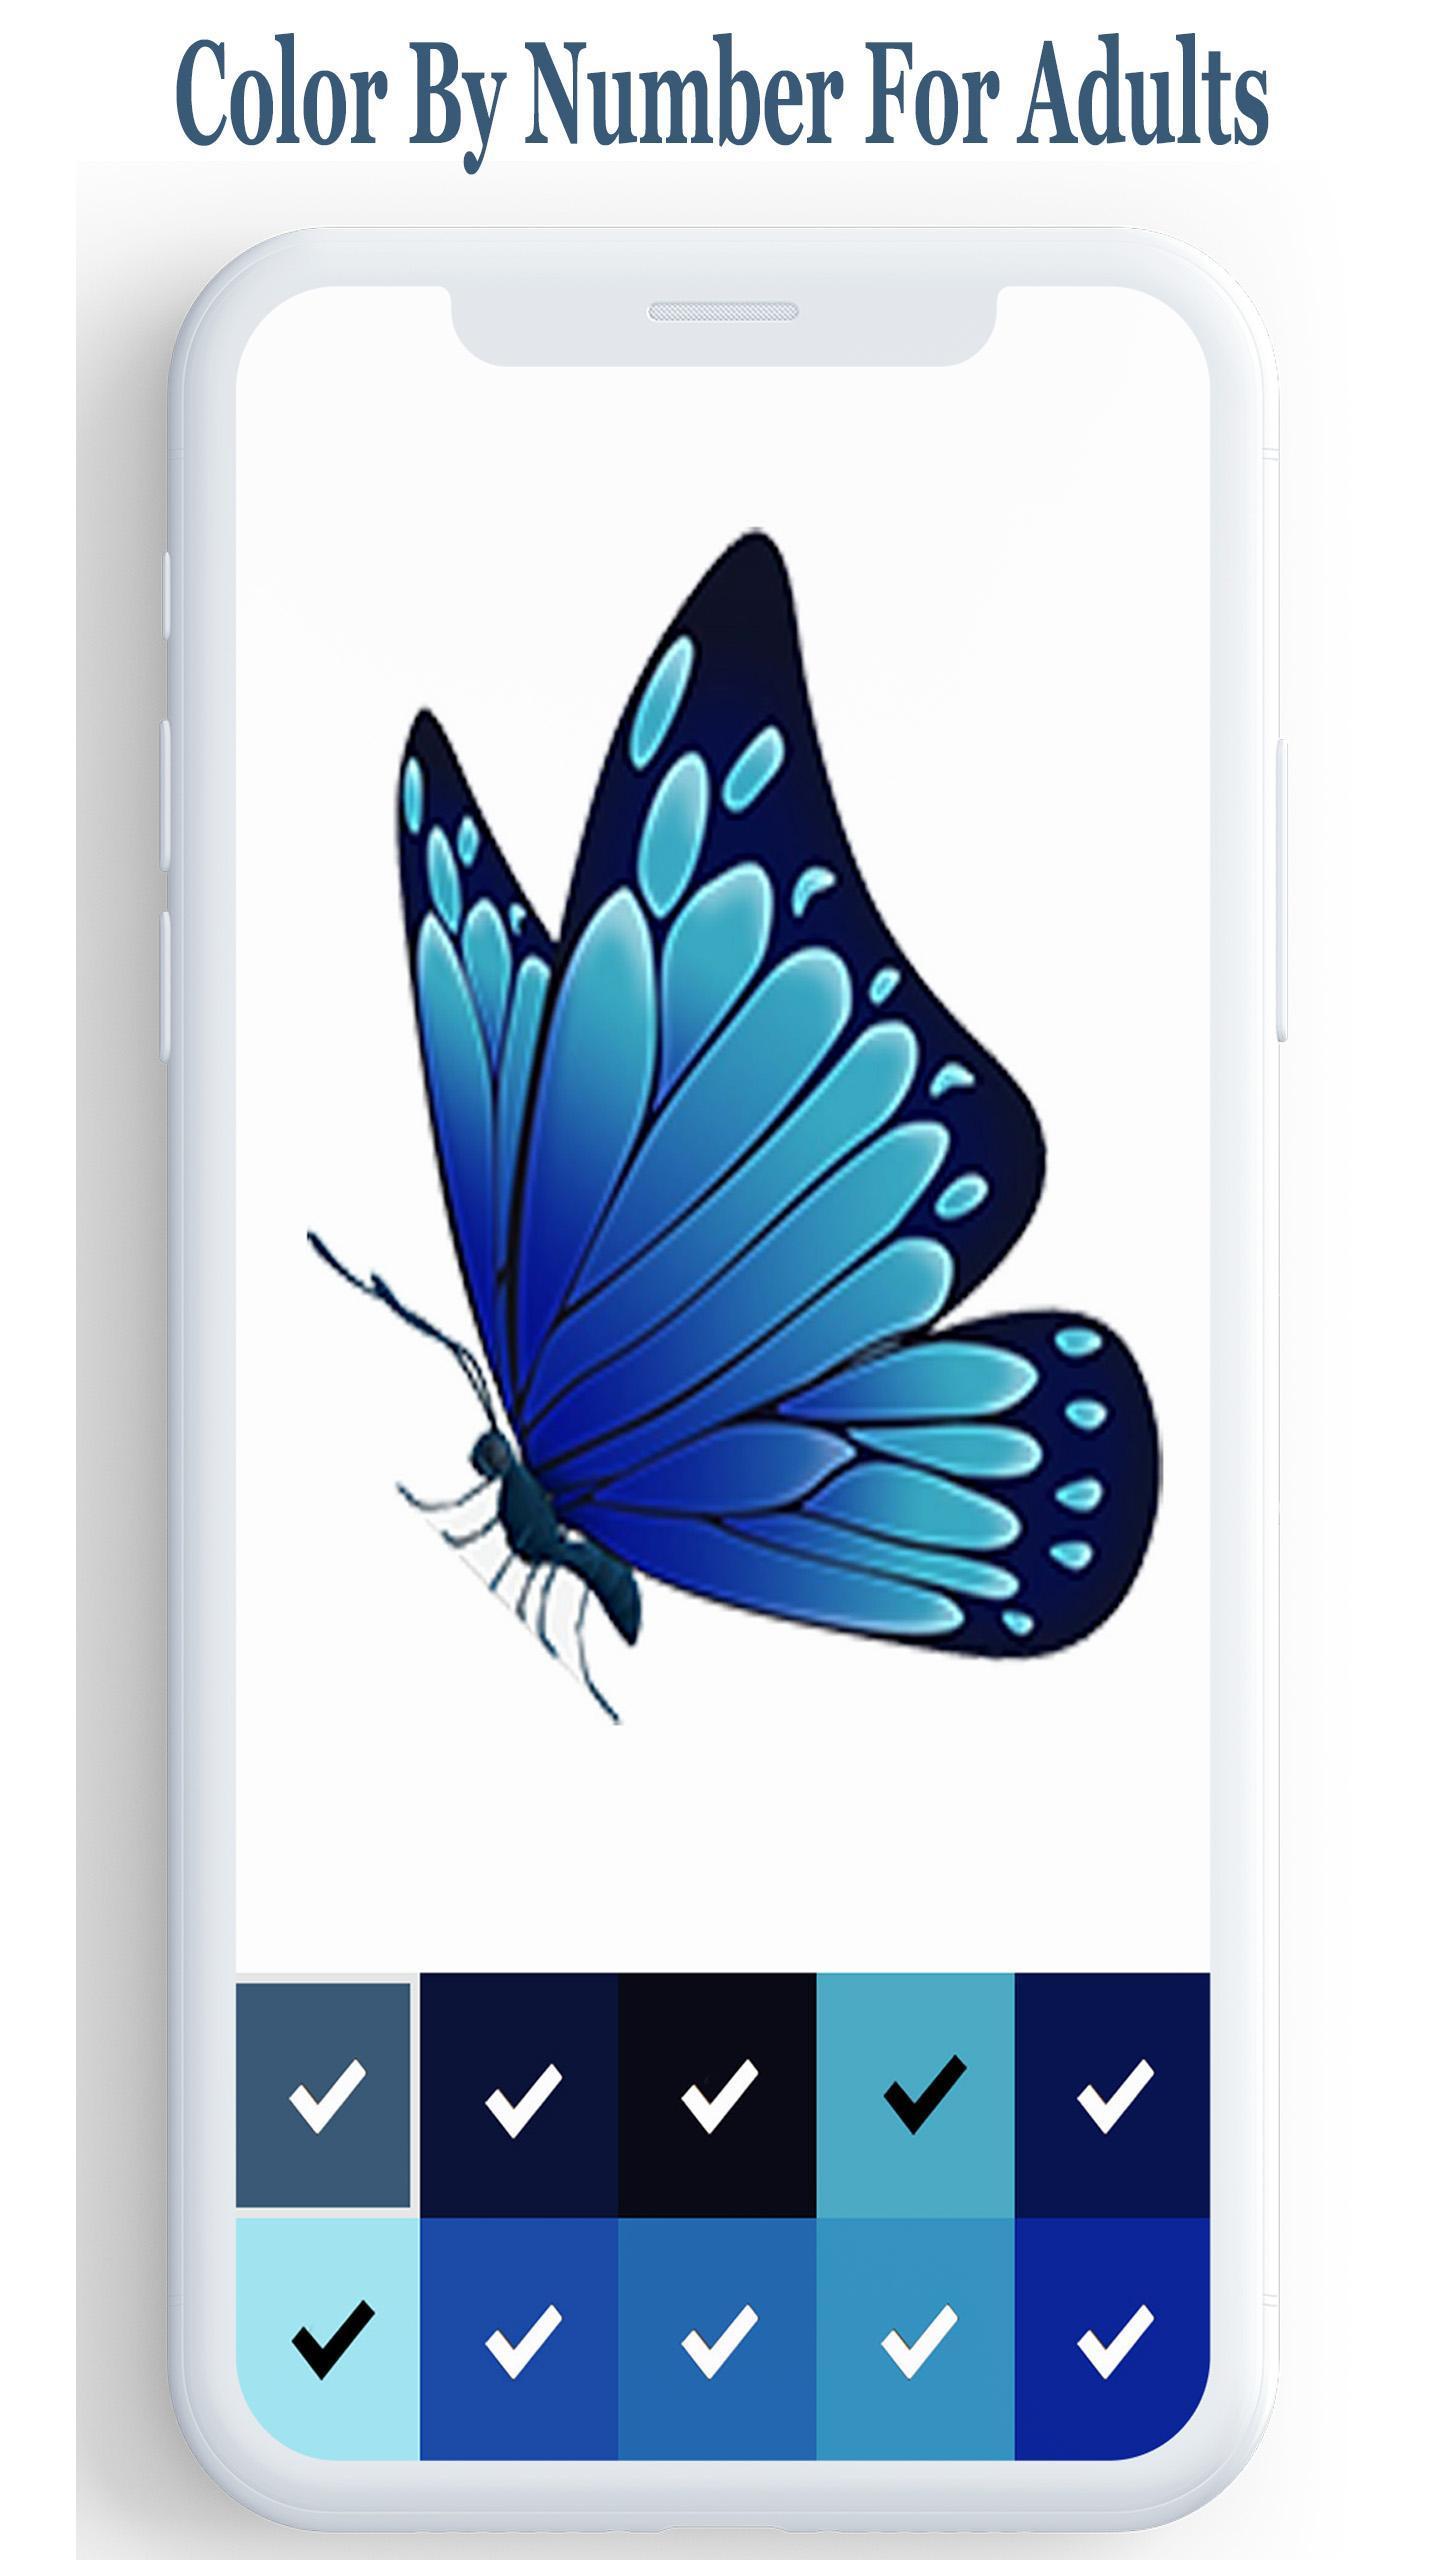 Android Icin Sayisina Gore Kelebek Rengi Kelebek Boyama Apk Yi